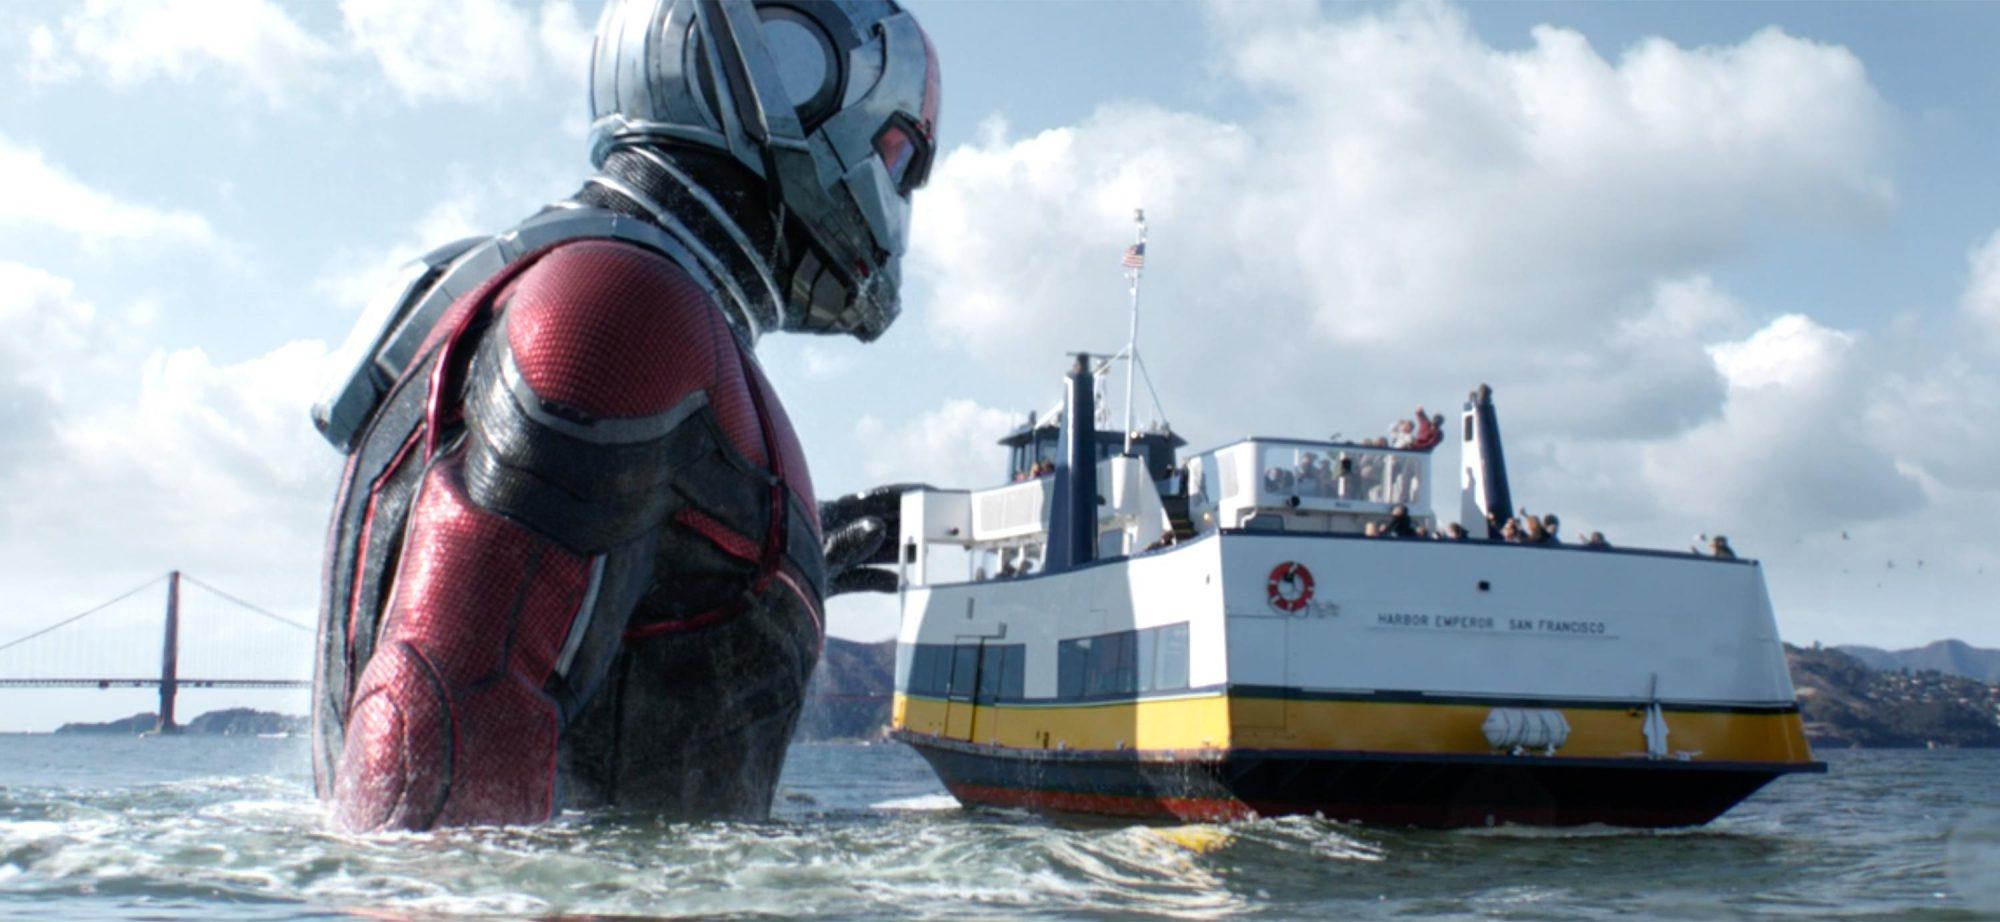 ant-man-wasp-trailer-24